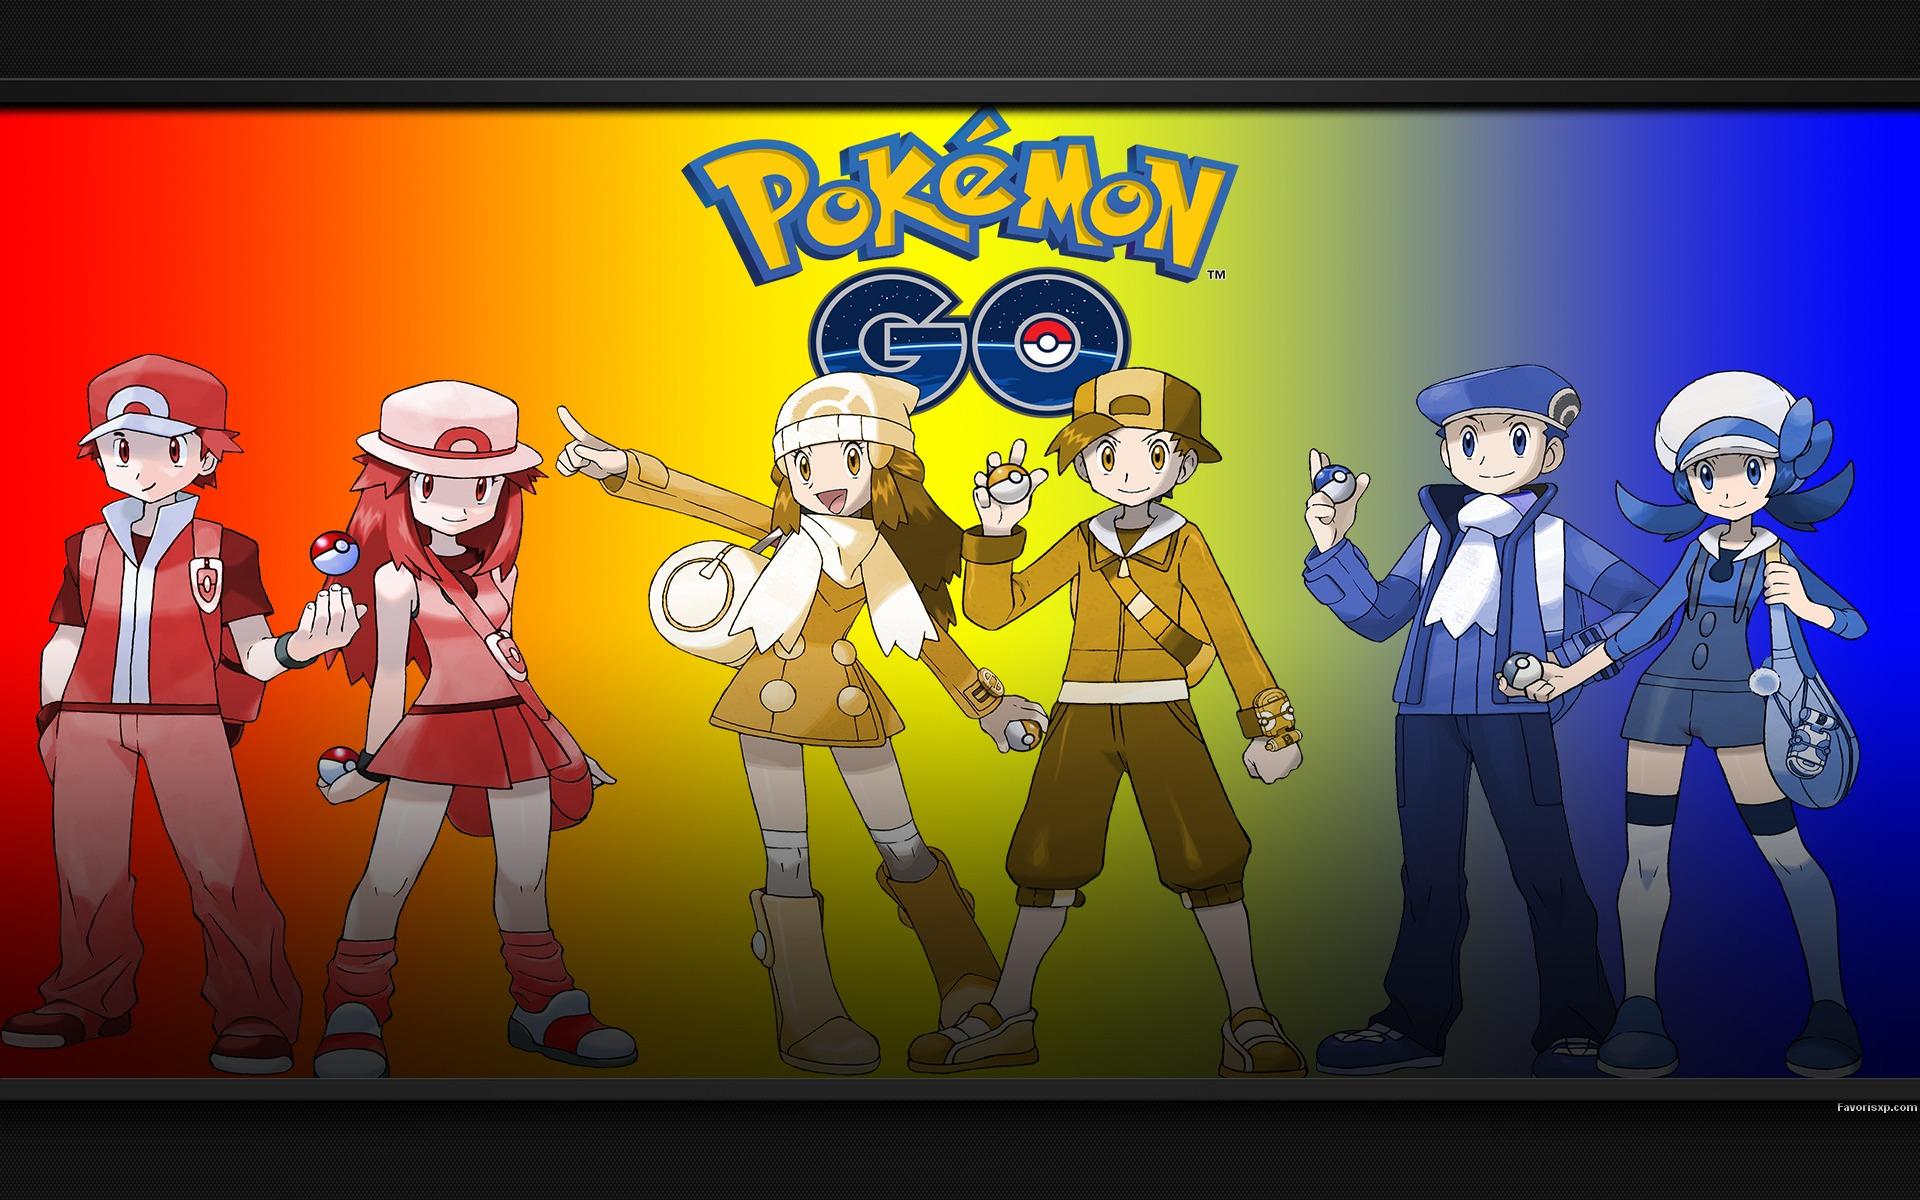 15 Pokemon Go Fonds D Ecran Instinct Mystic Valor